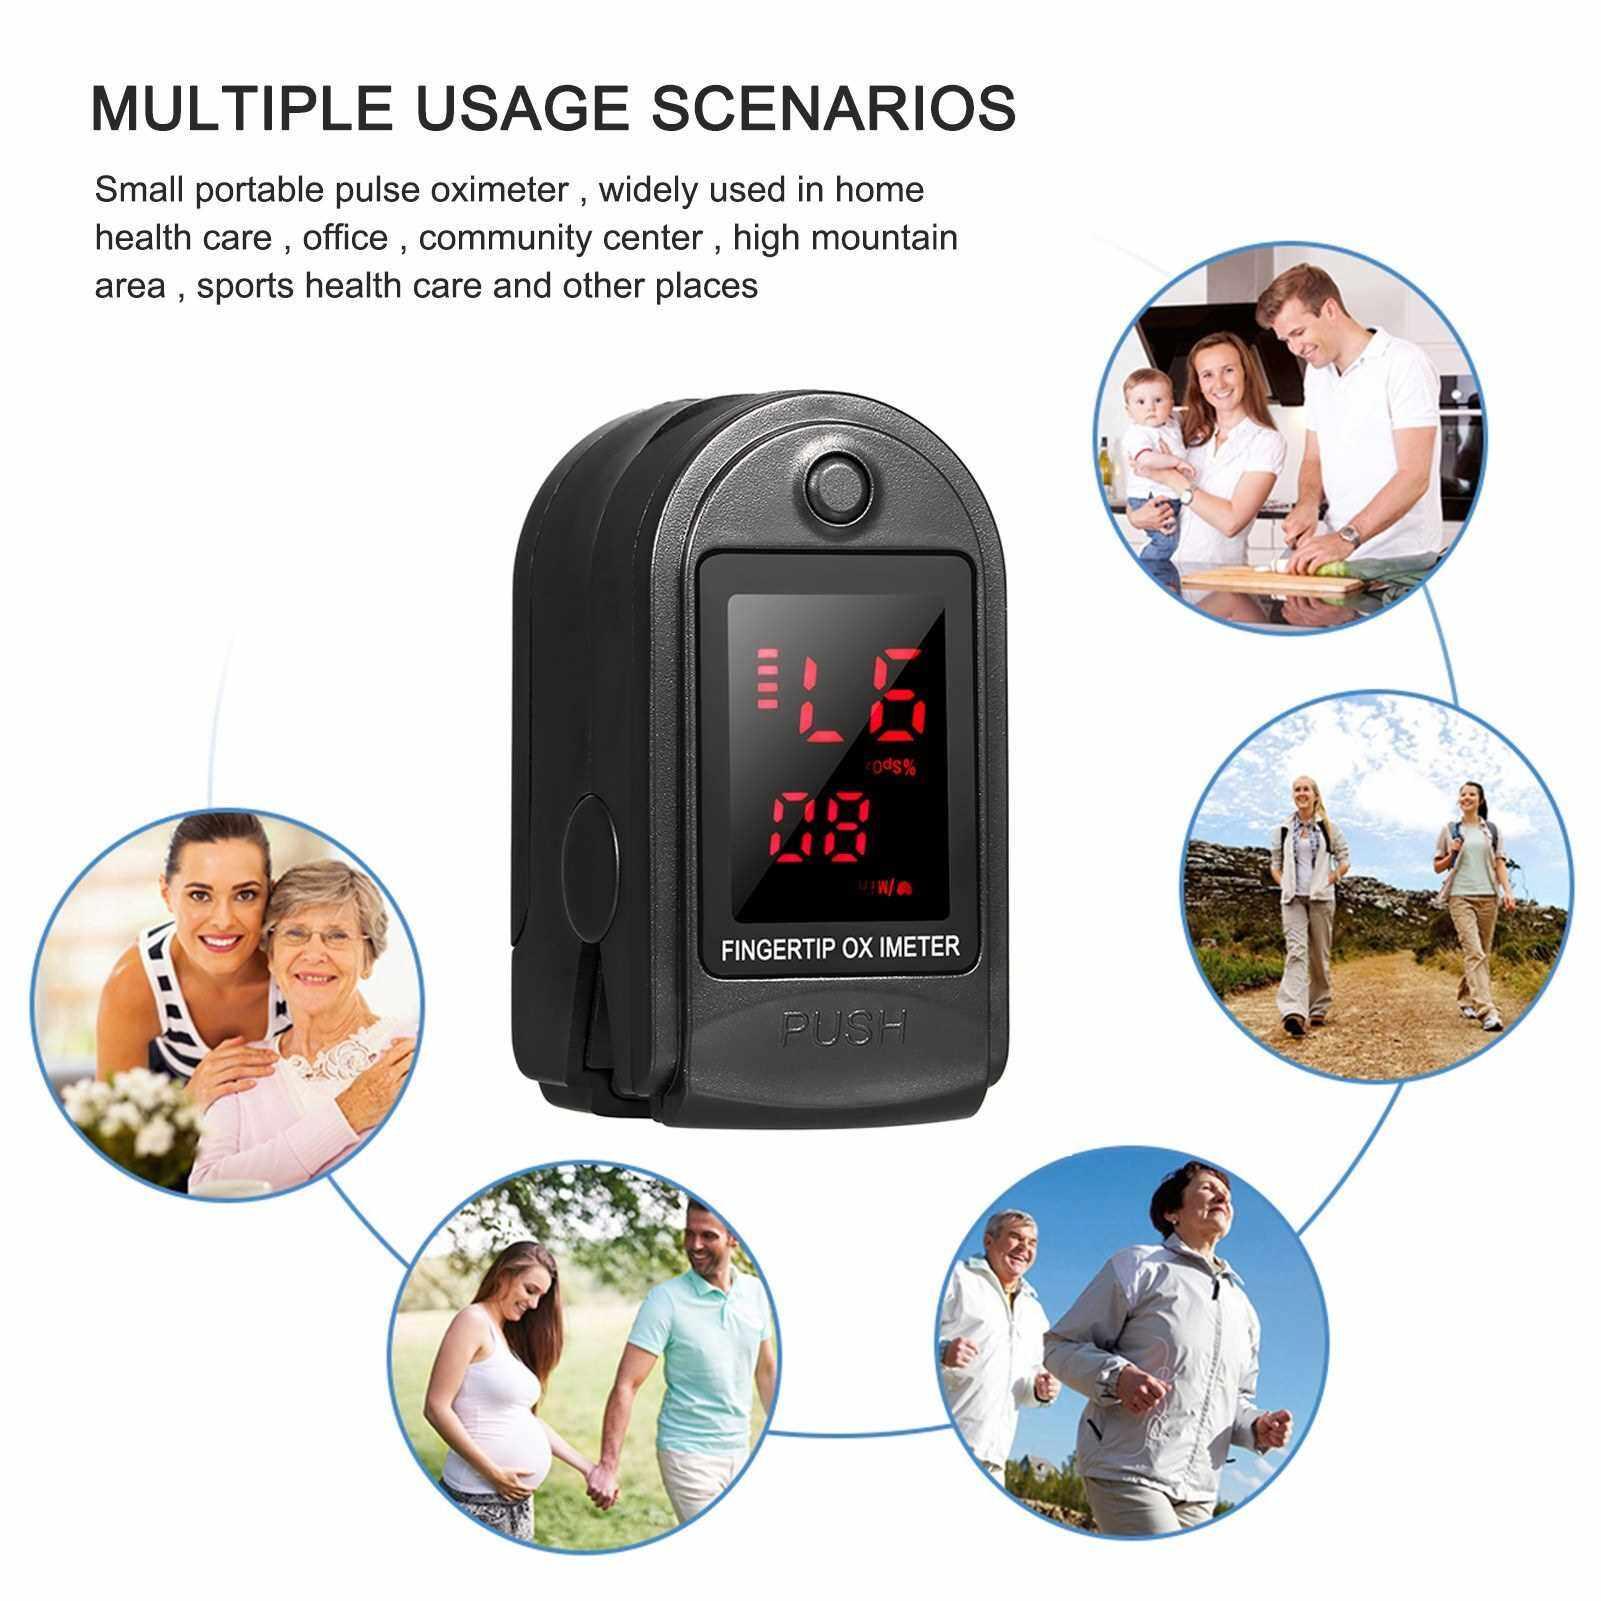 Best Selling Blood Oxygen Monitor Fast Reading Finger Pulse Oximeter Mini SpO2 Monitor Oxygen Saturation Monitor Measuring Gauge Device (Standard)